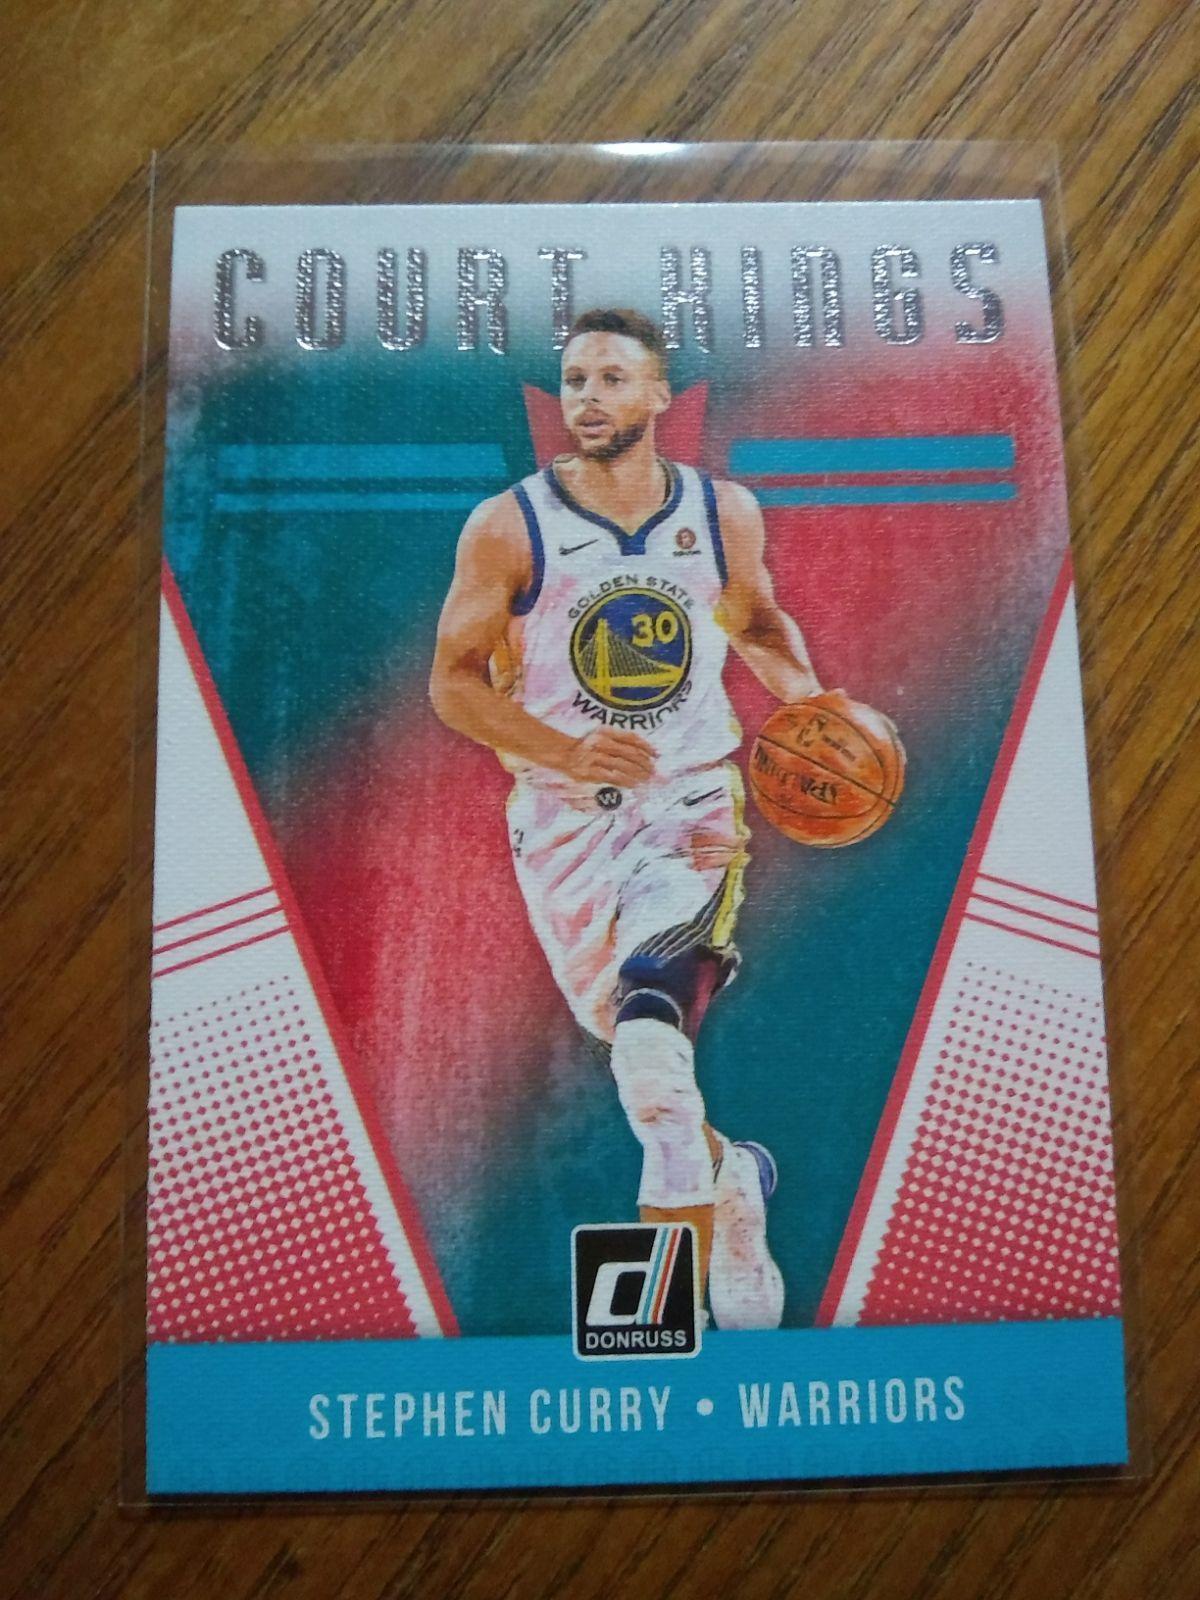 Stephen Curry Golden State Warriors Basketball Card Basketball Cards Stephen Curry Basketball Golden State Warriors Basketball